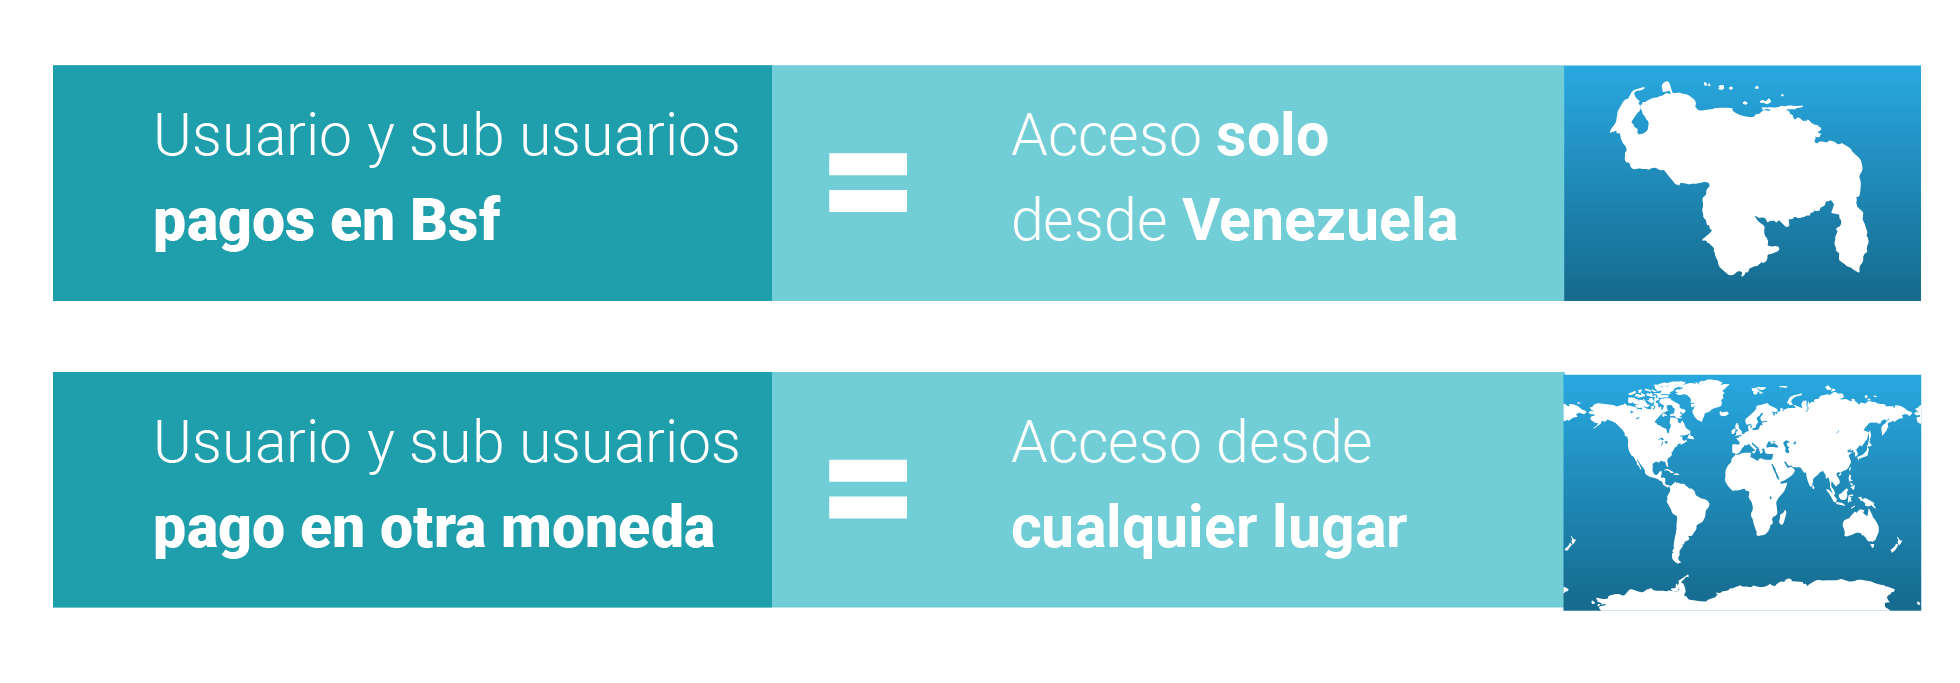 Pagos en bolivares